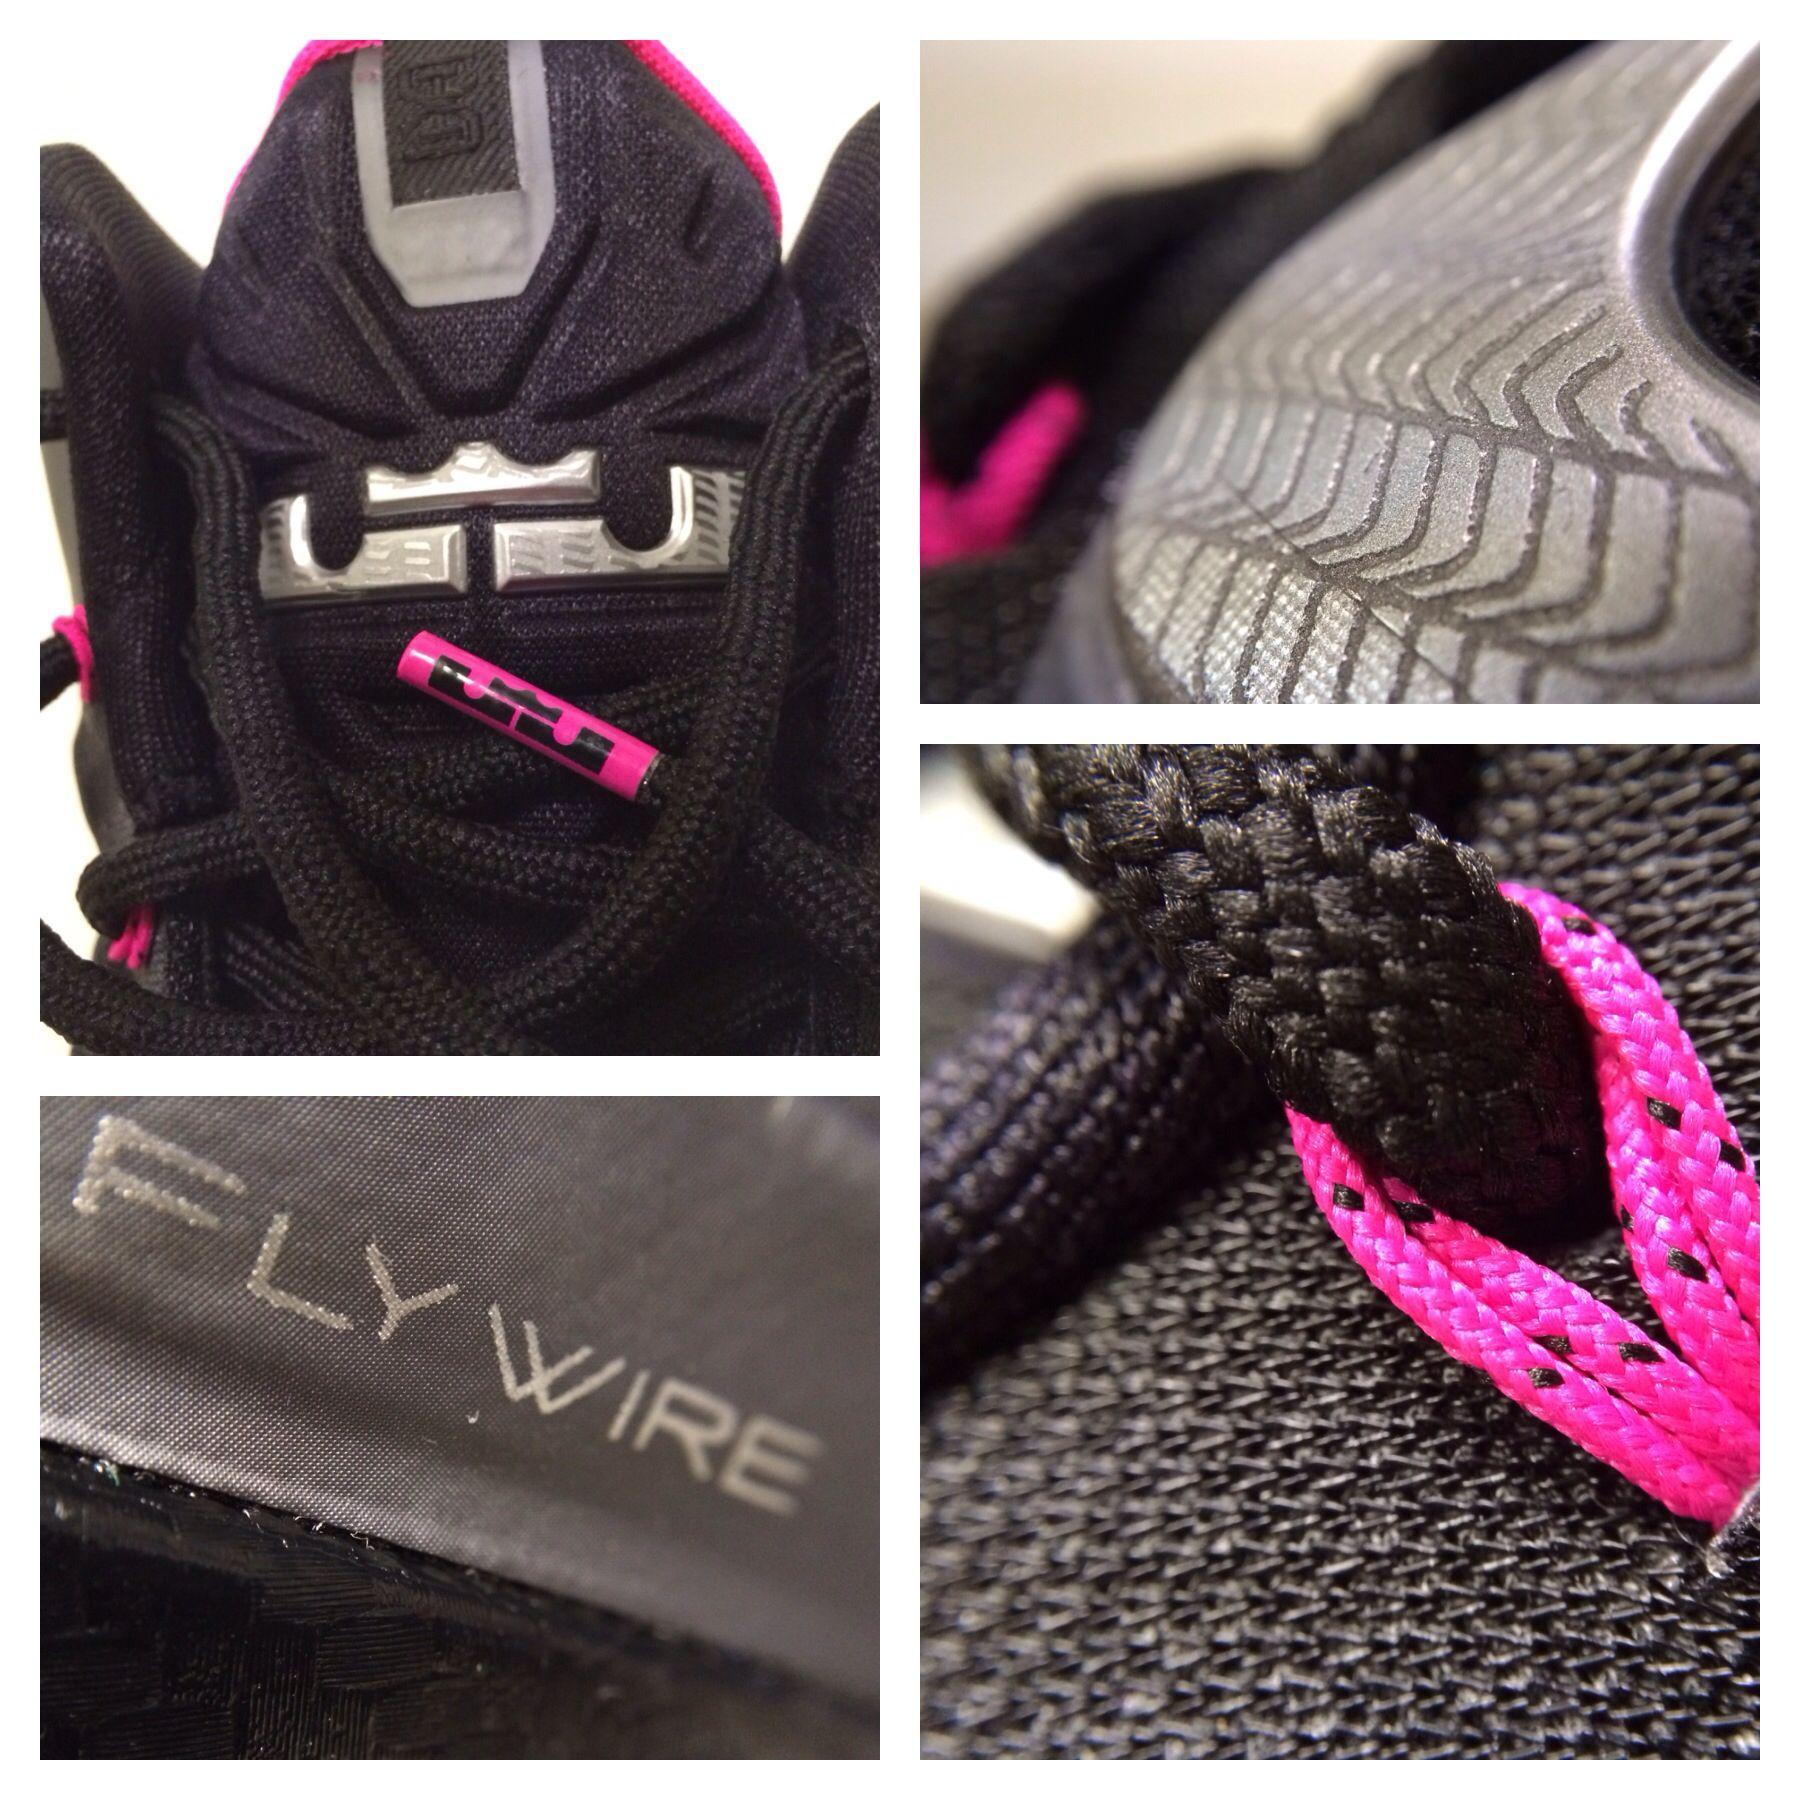 "Available 12/14/13- Nike Lebron XI ""Miami Nights"" (MNS, GS)- Blk/ Mtllc Slvdr #jimmyjazz #trendingnow #nike #lebron11 #miaminights #igsneakercommunity #Lebronjames jimmyjazz.com"